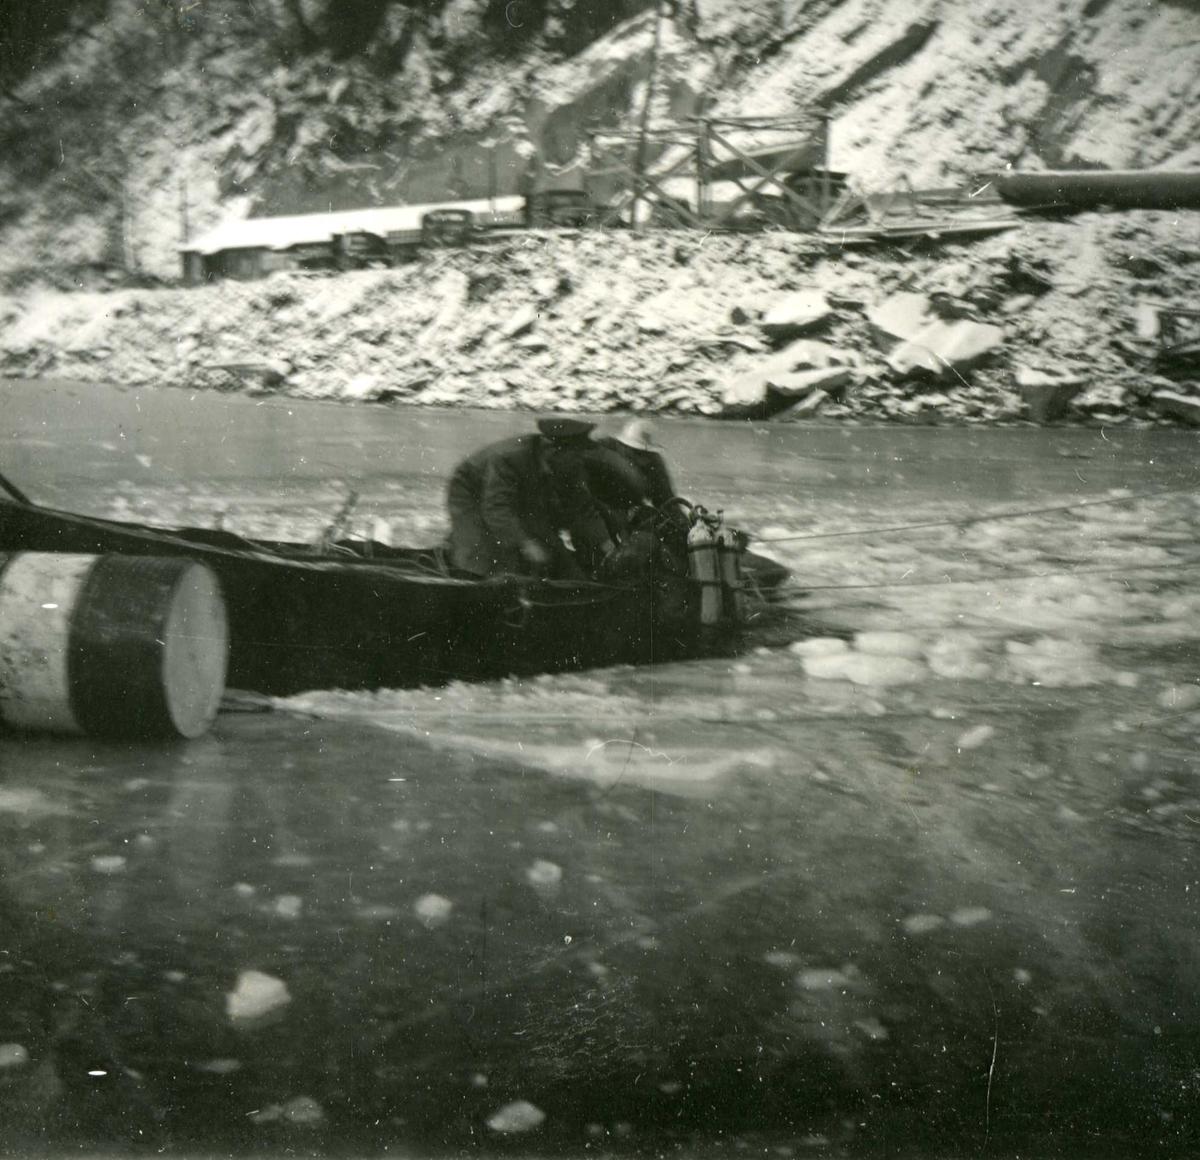 Dalen, lastebil i vannet 7, 13.12.58